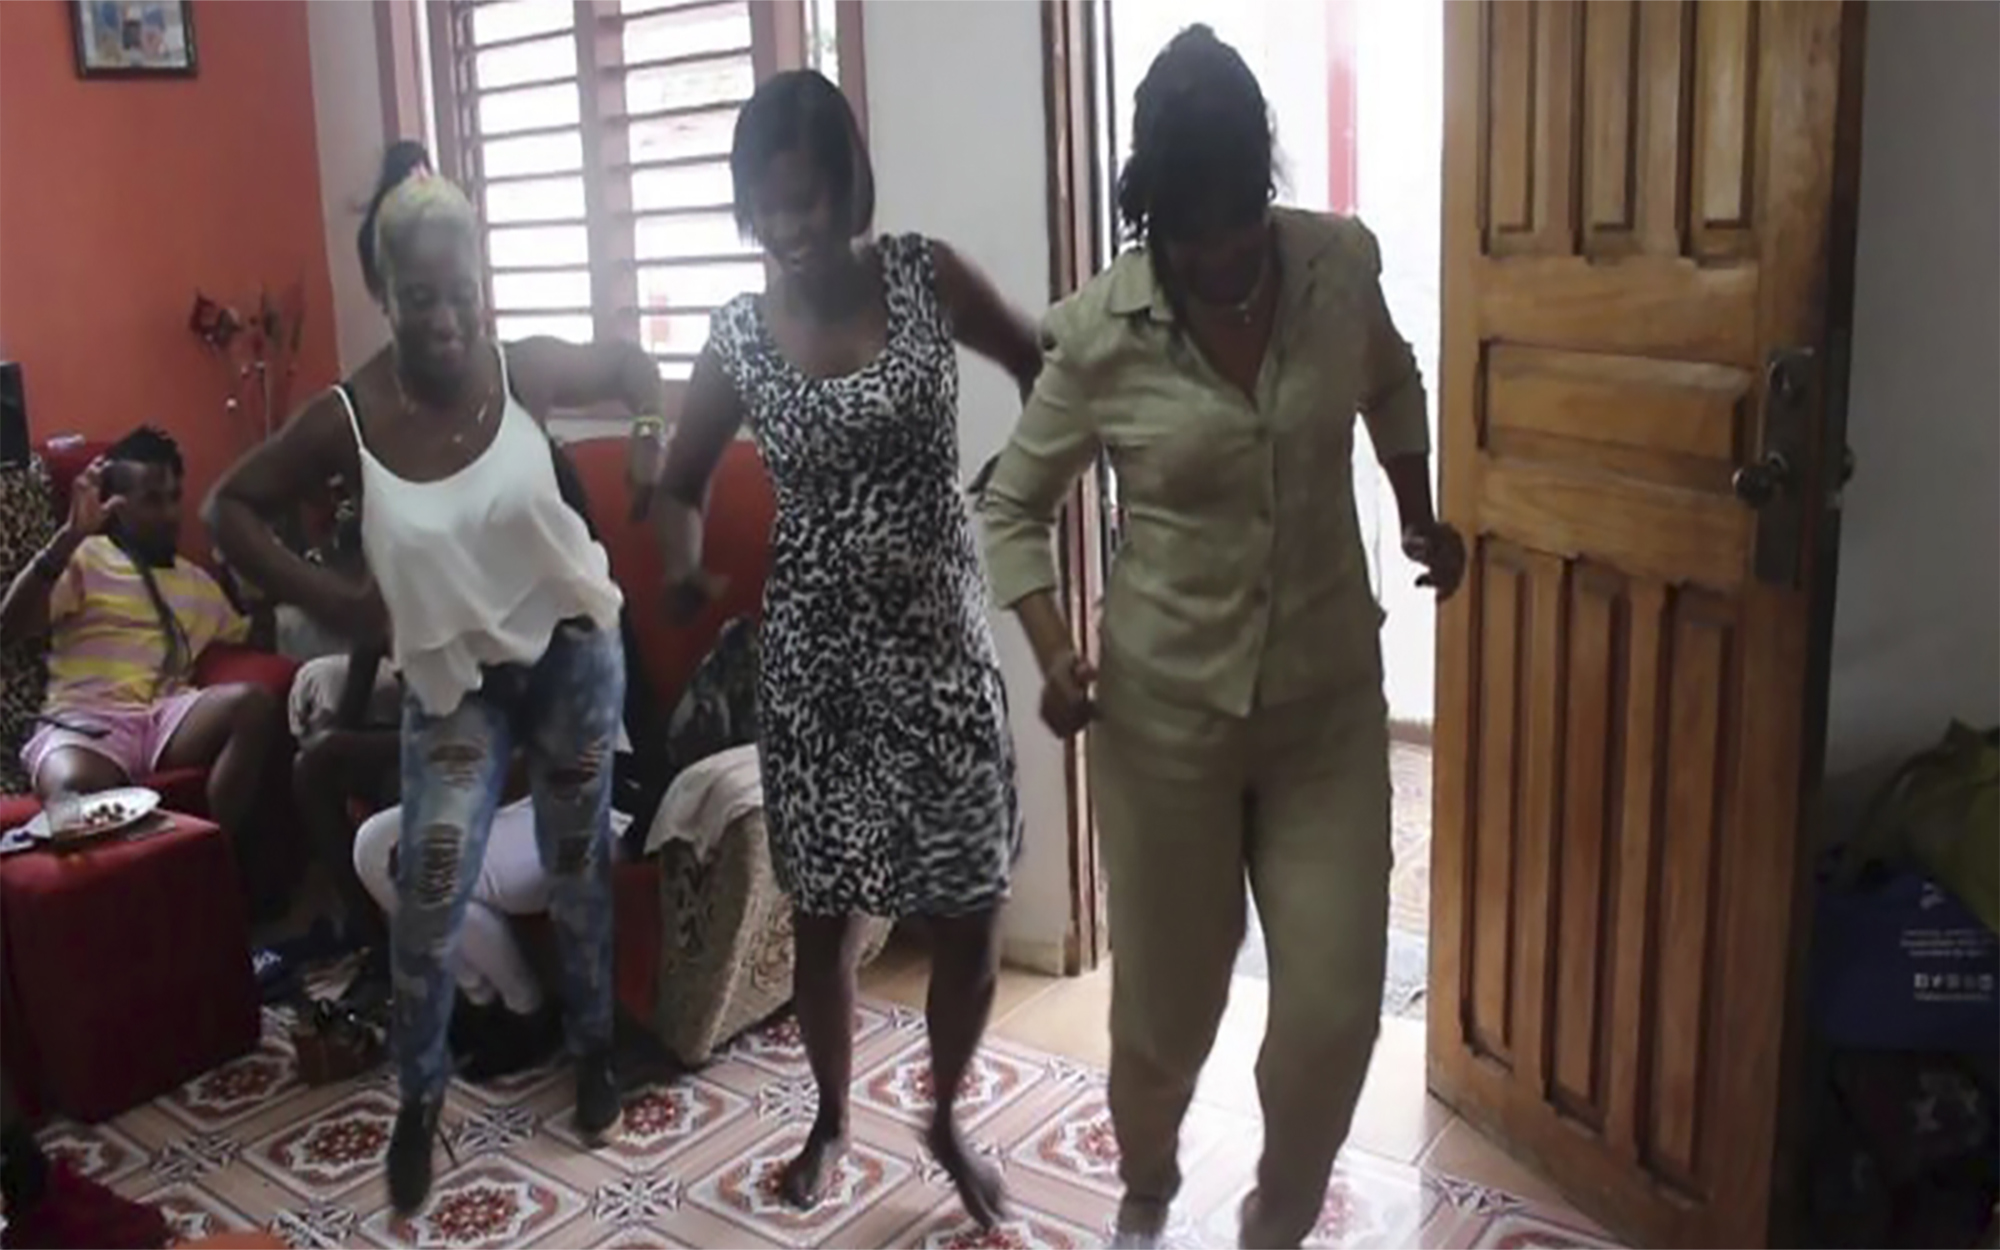 Old_ladies_dancing_in_havana_djmuki